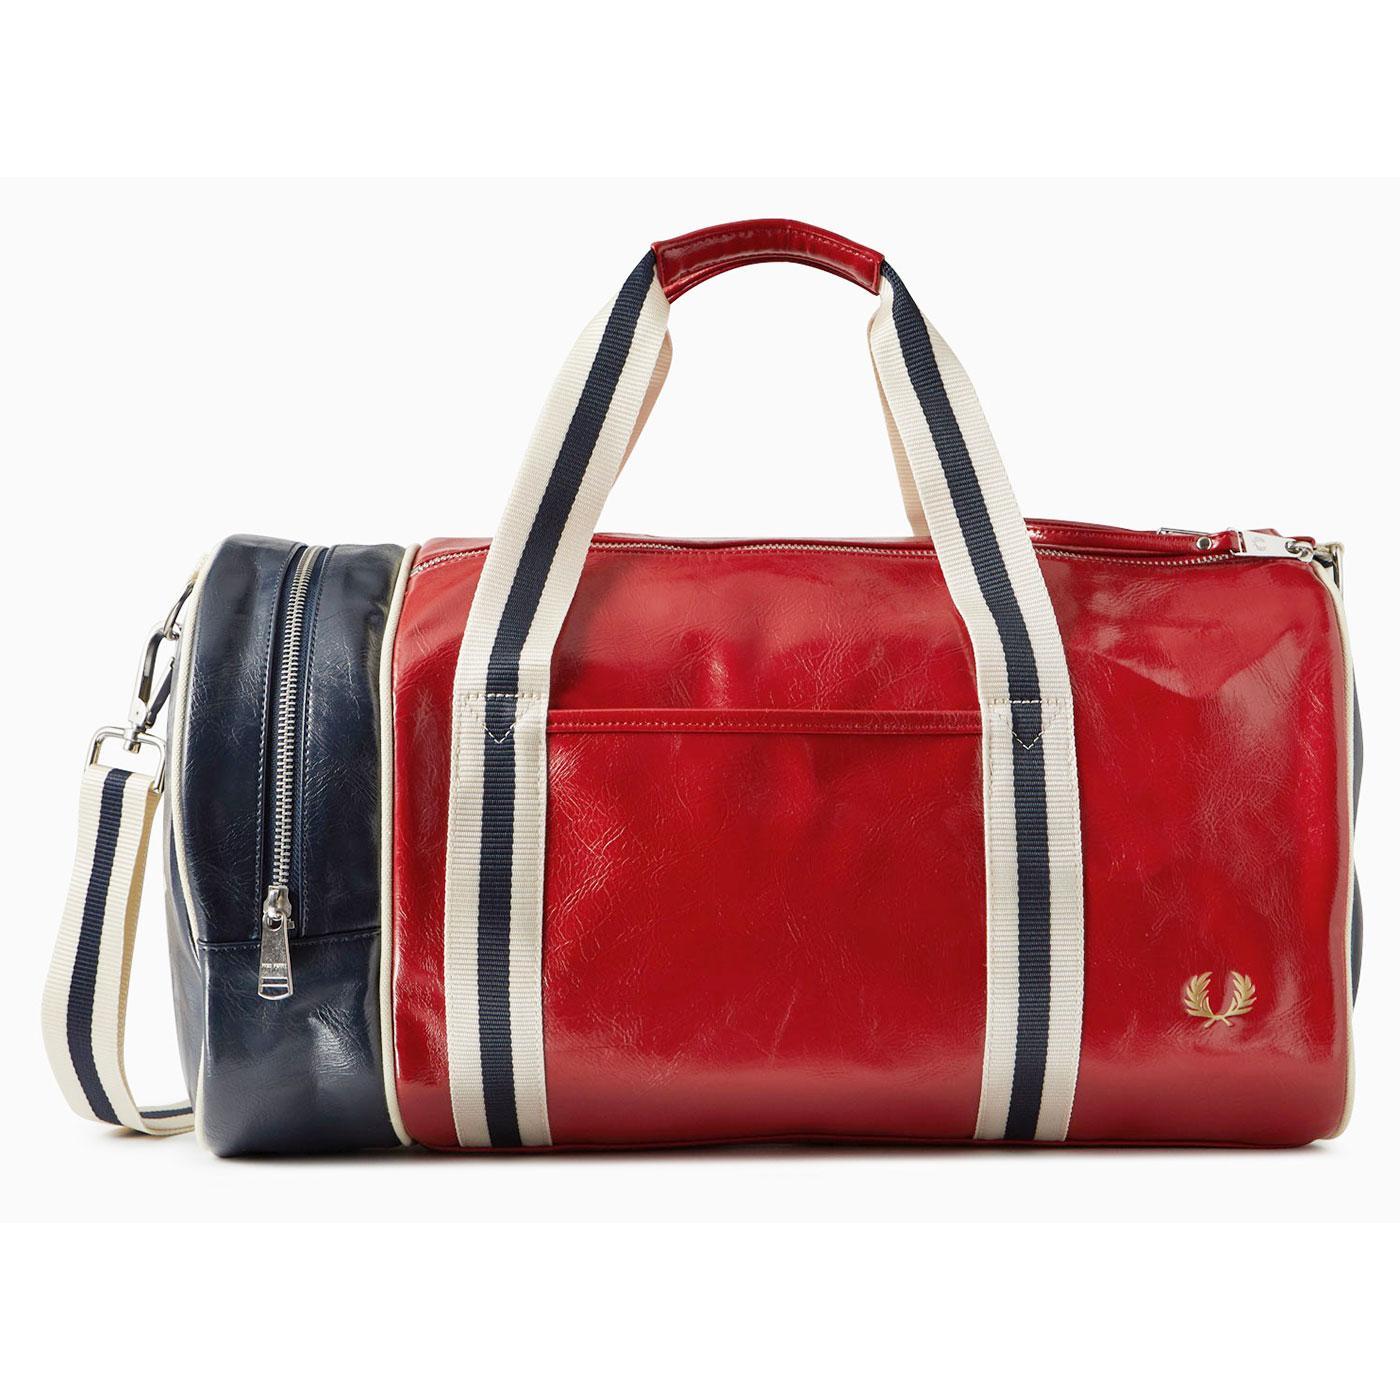 FRED PERRY Colour Block Classic Barrel Bag R/N